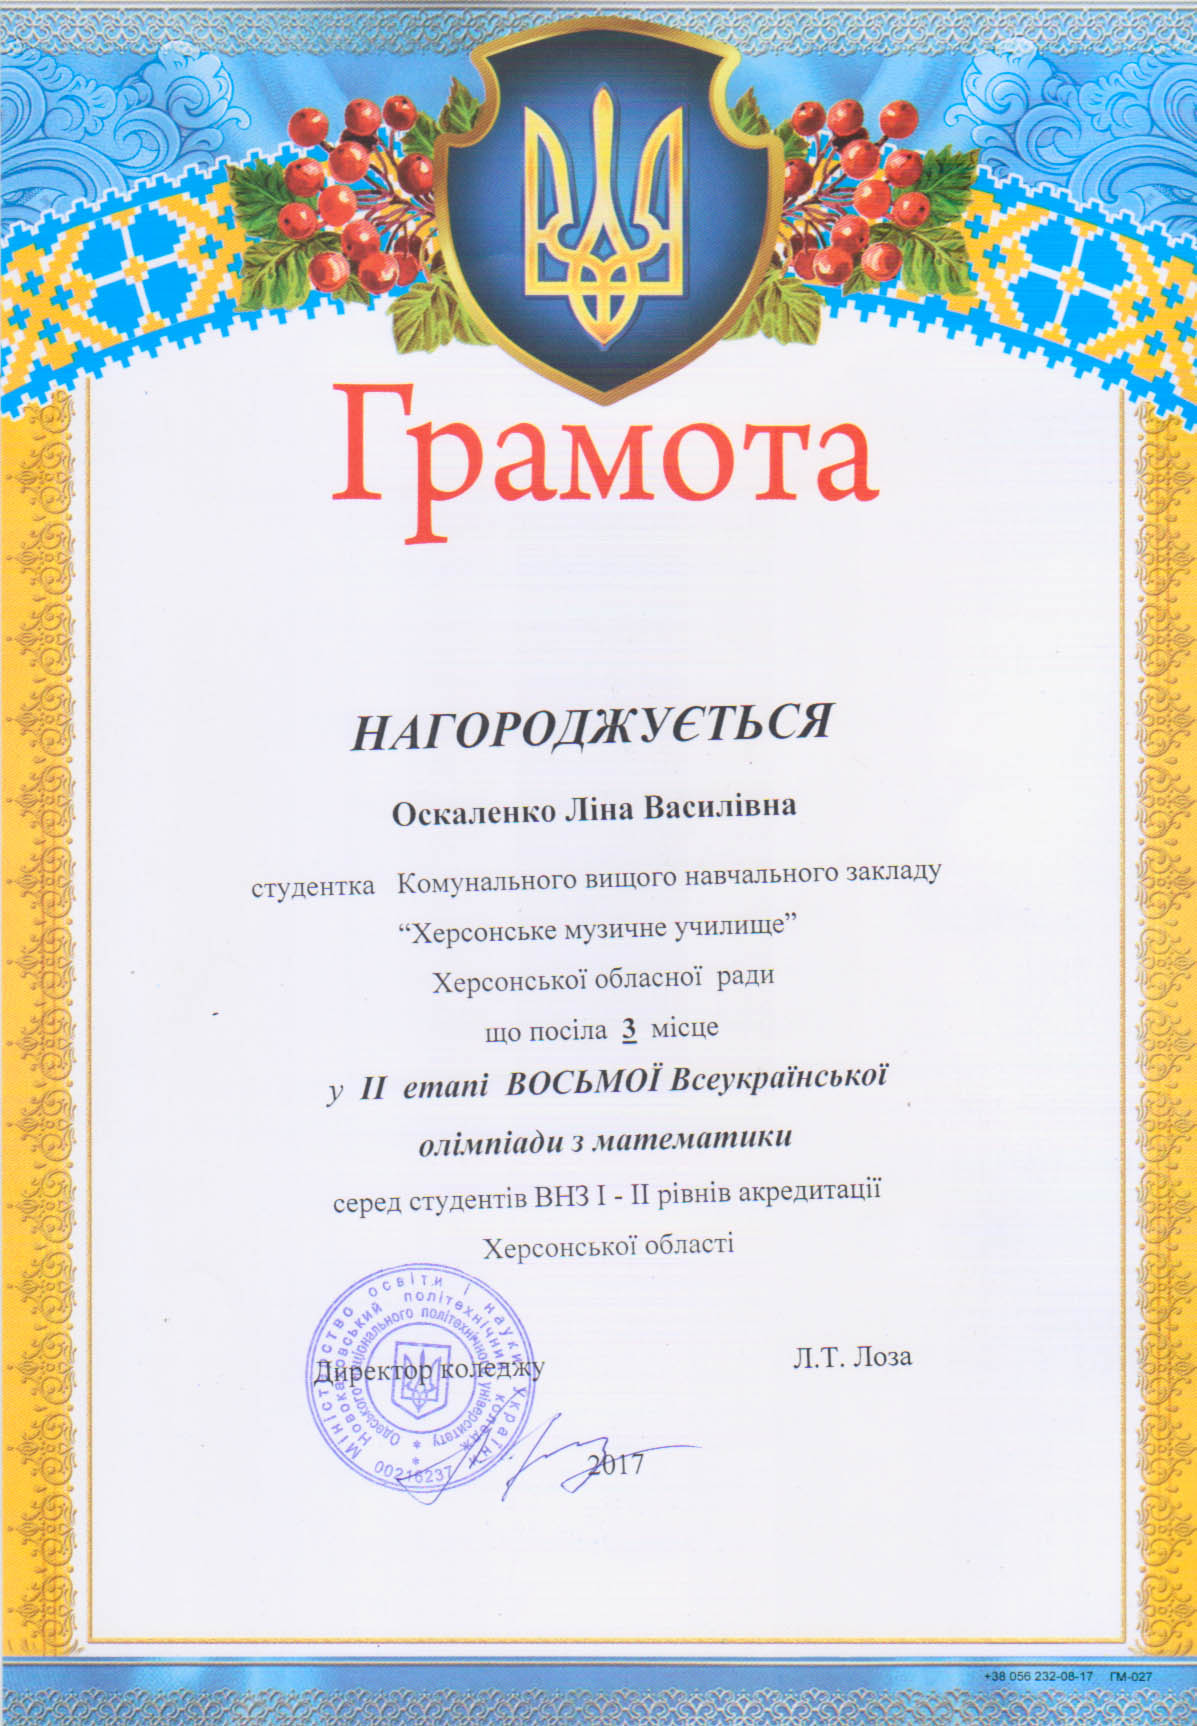 Оскаленко Грамота